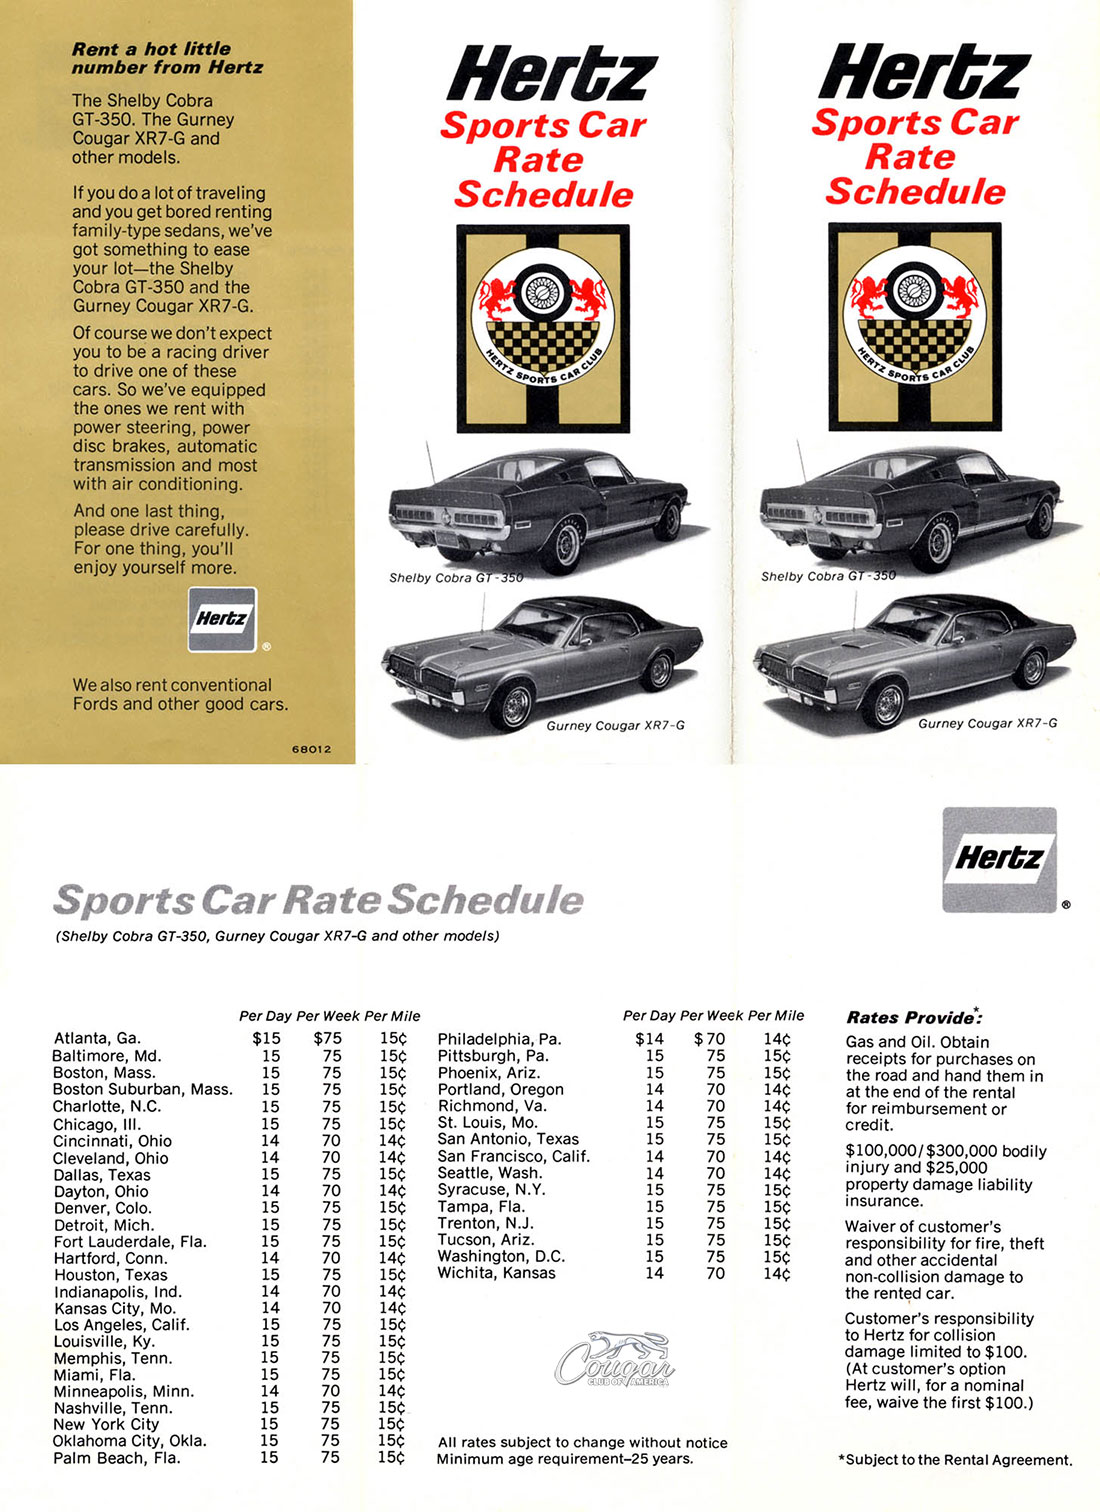 Hertz Car Rate for the 1969 Mercury Cougar XR7-G